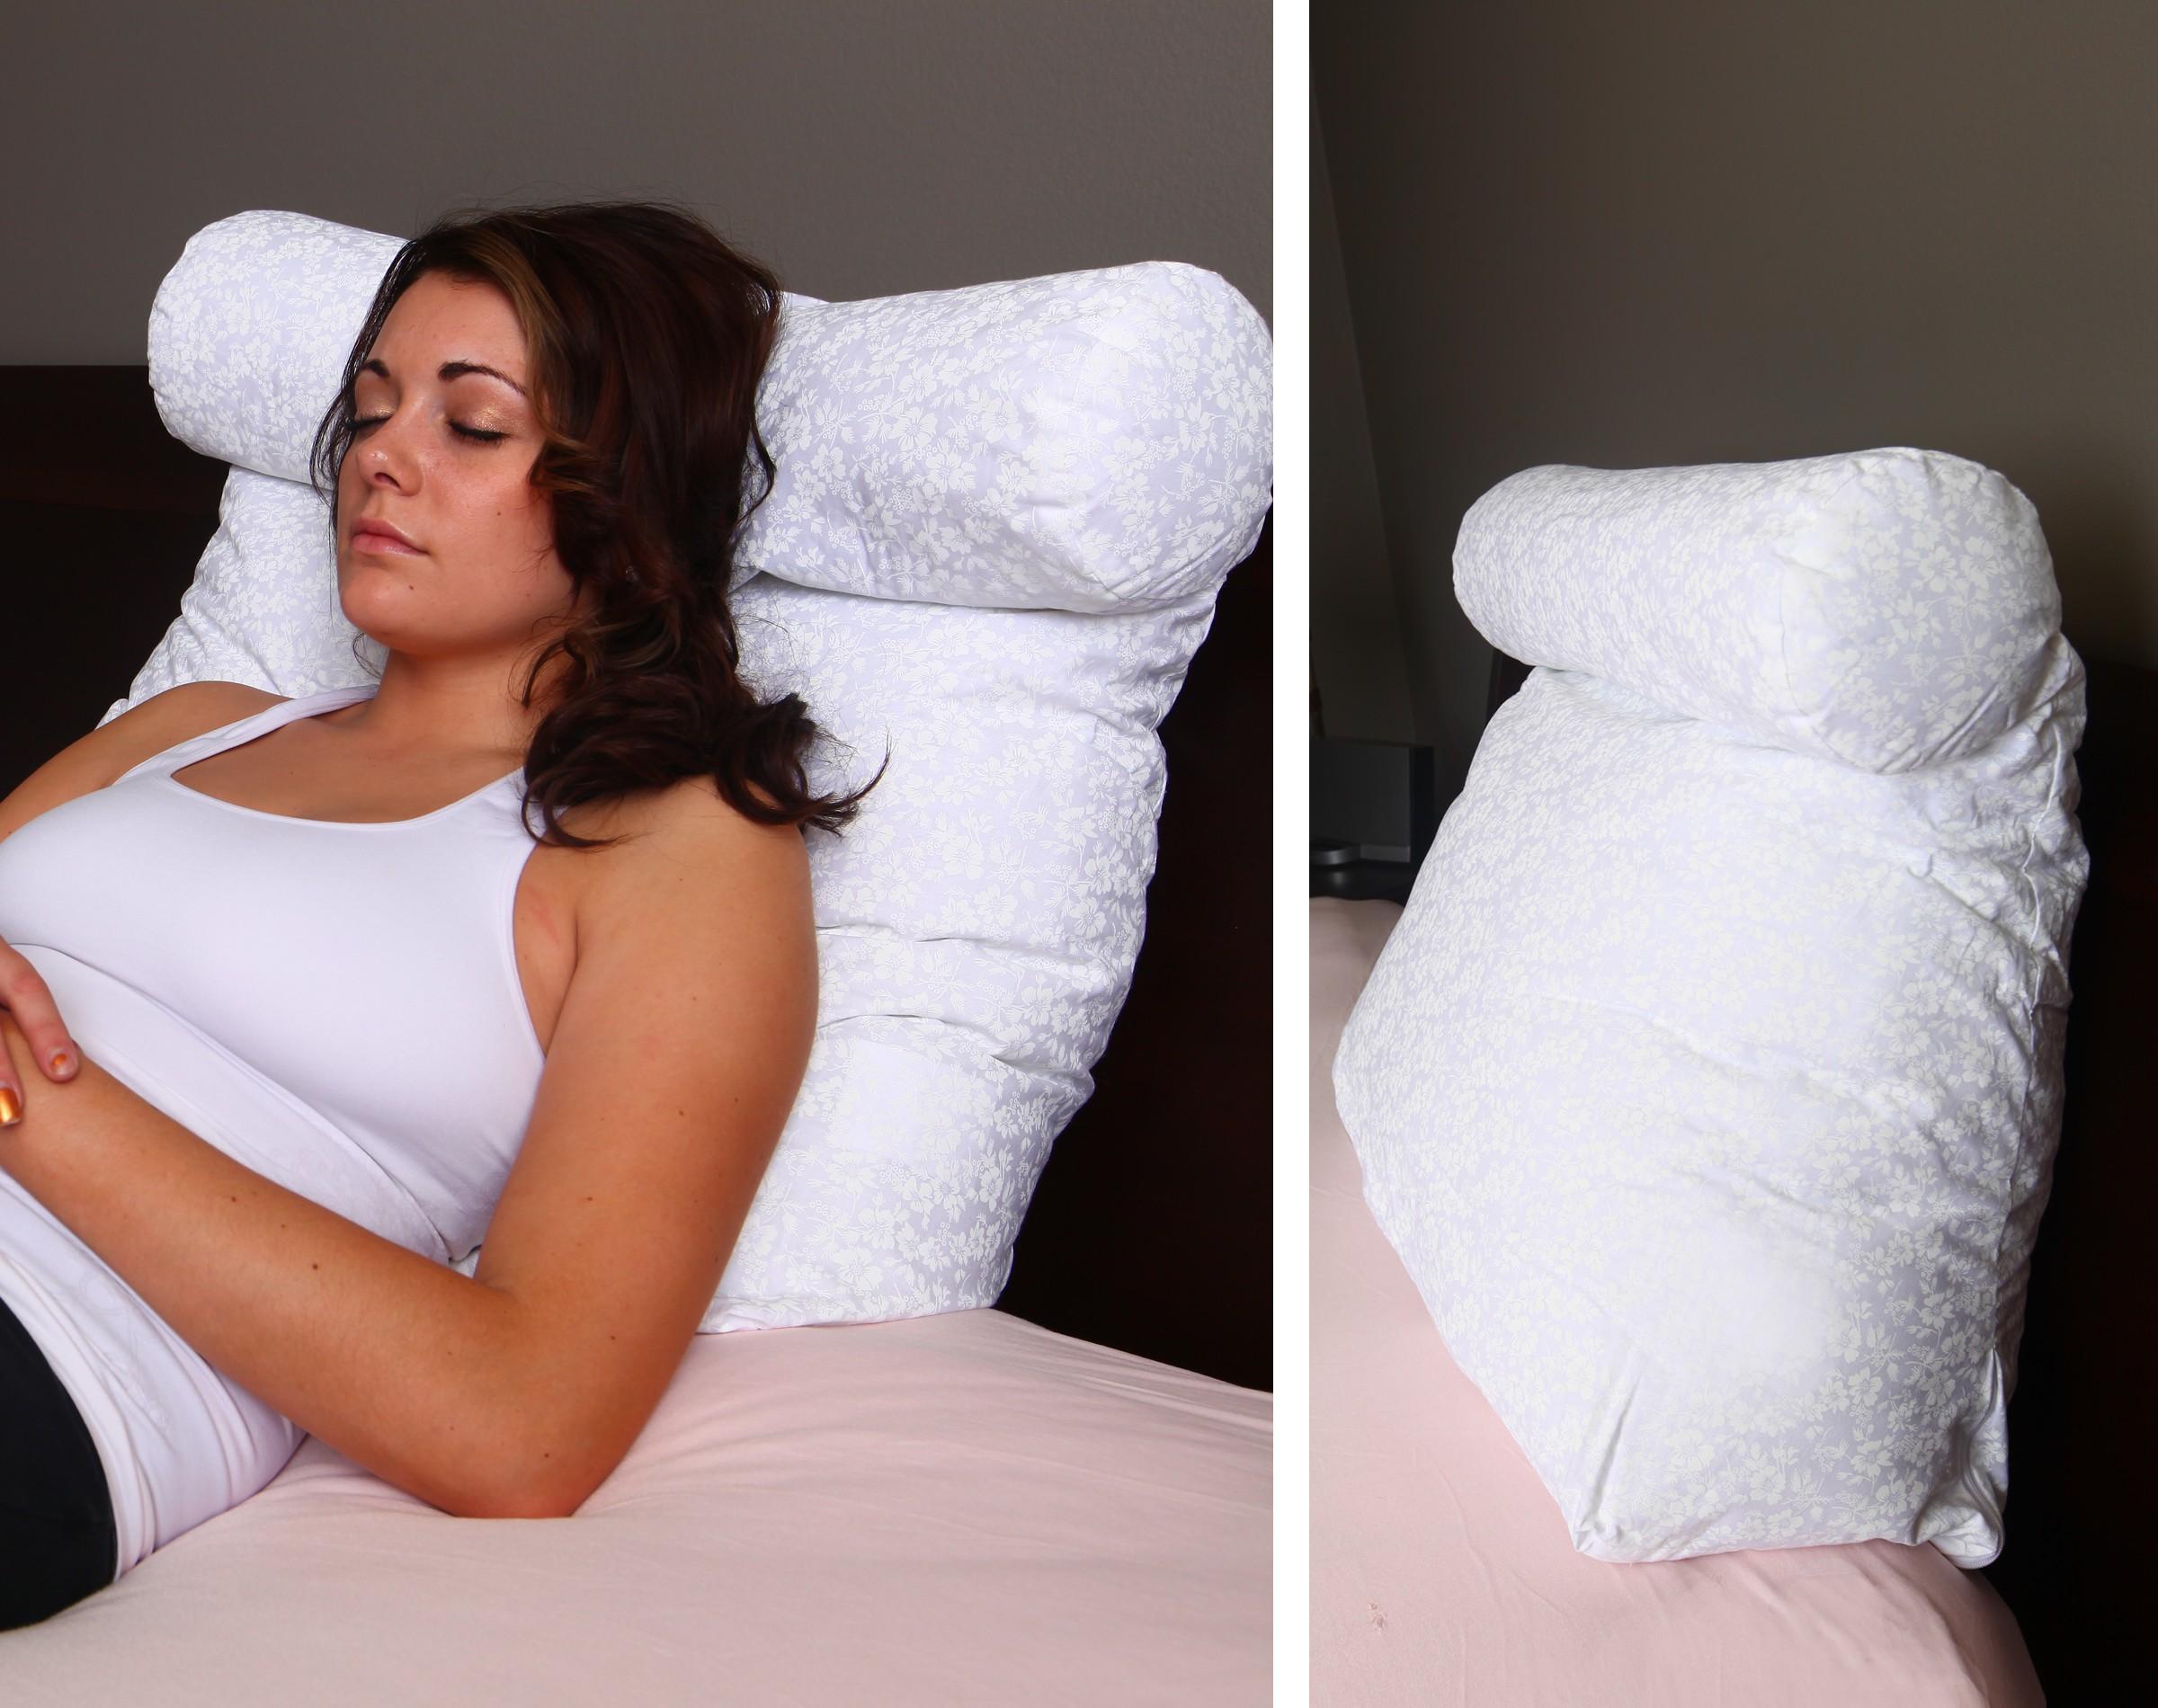 medical back support pillow online